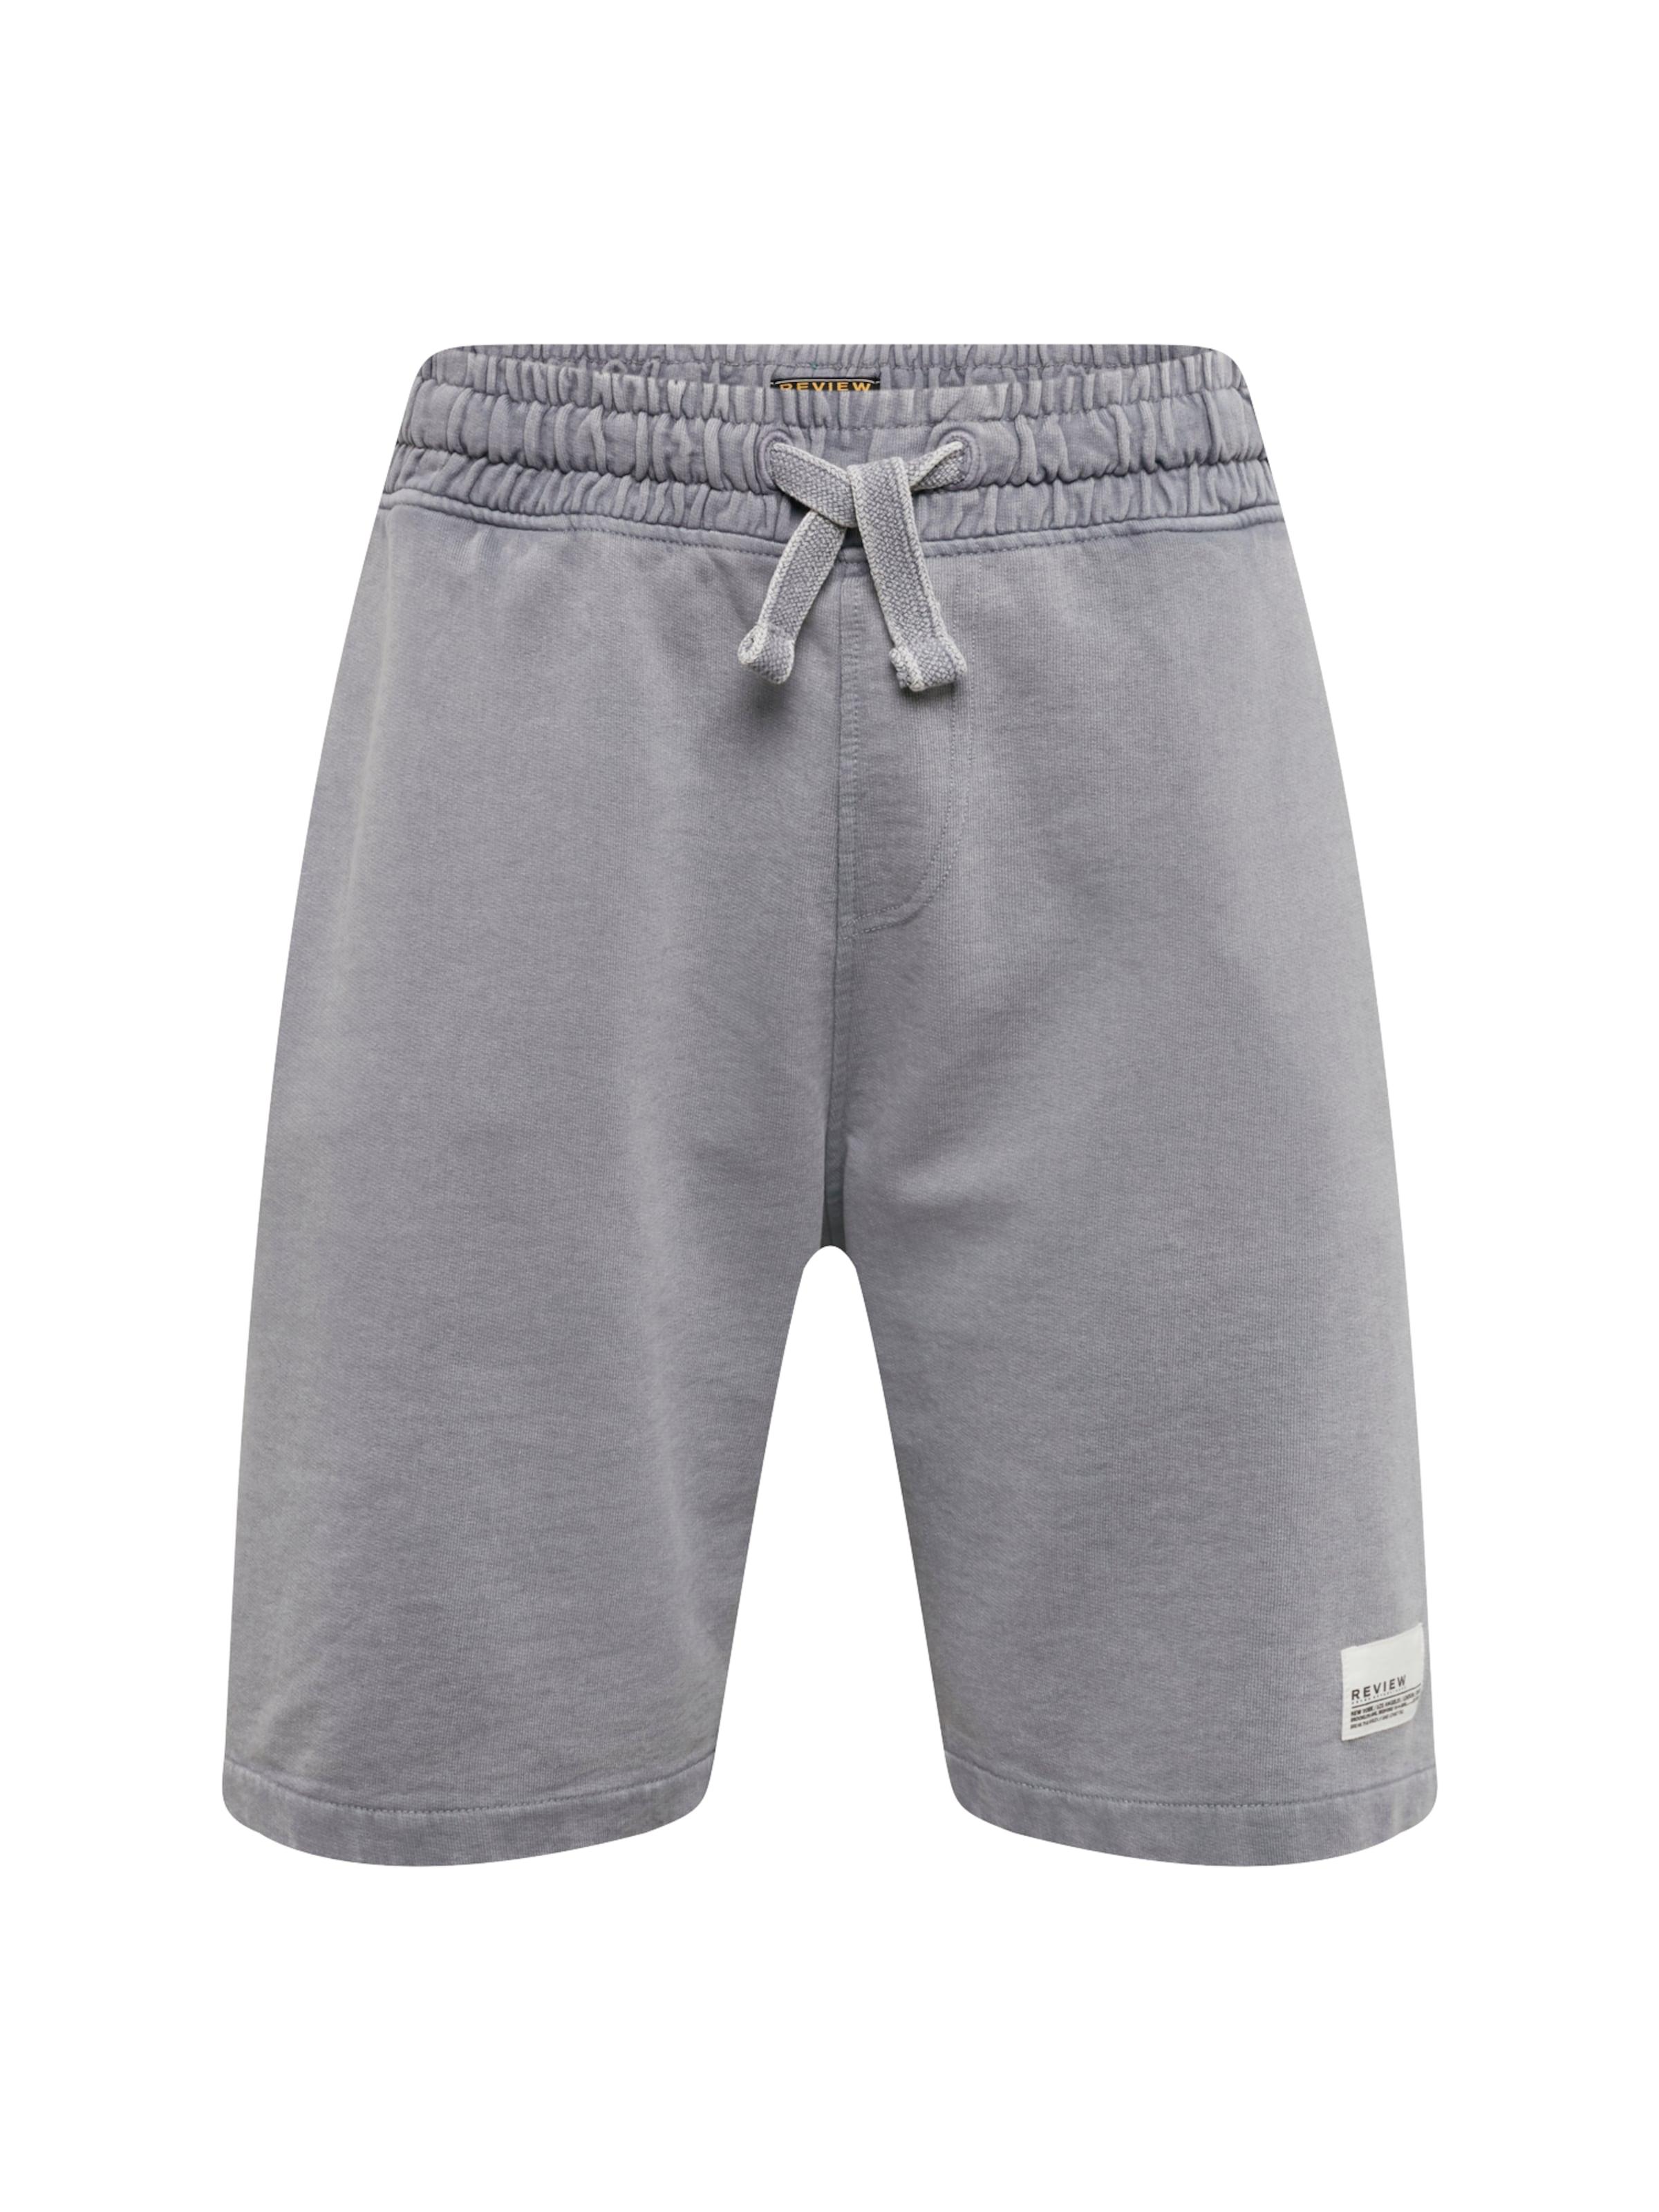 Easy' 'shorts Hosen Grau Review In ZkuXiP